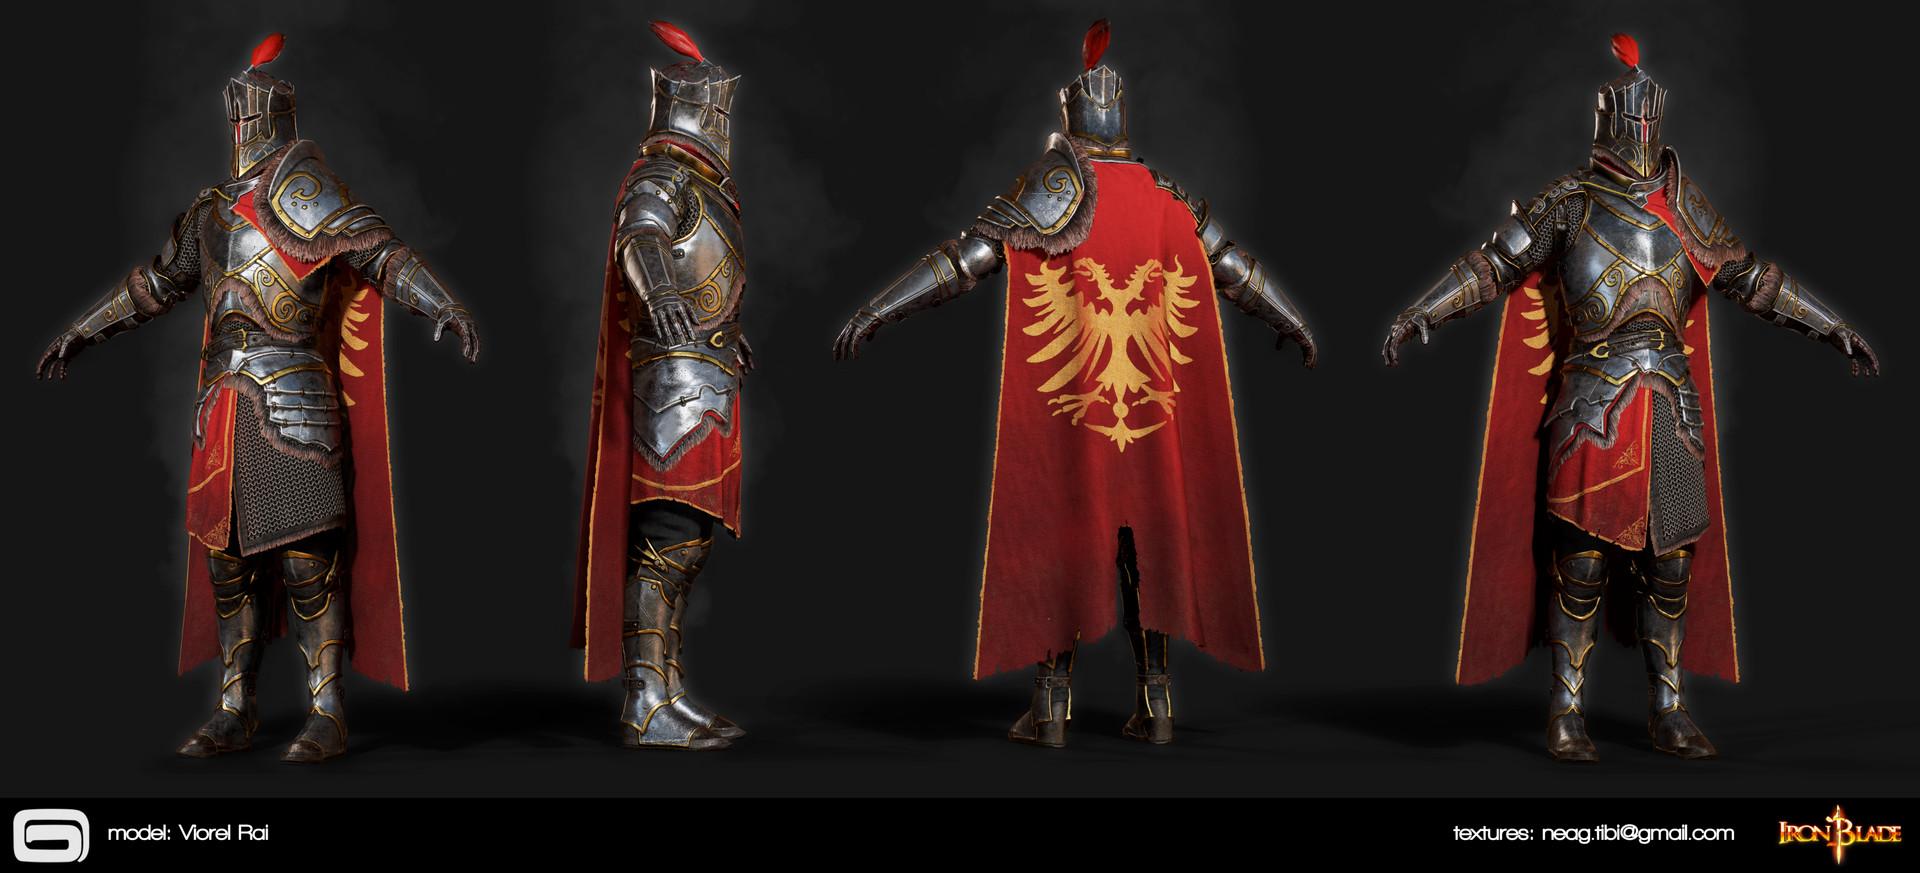 Tibi neag tibi neag iron blade mc armor 08c2